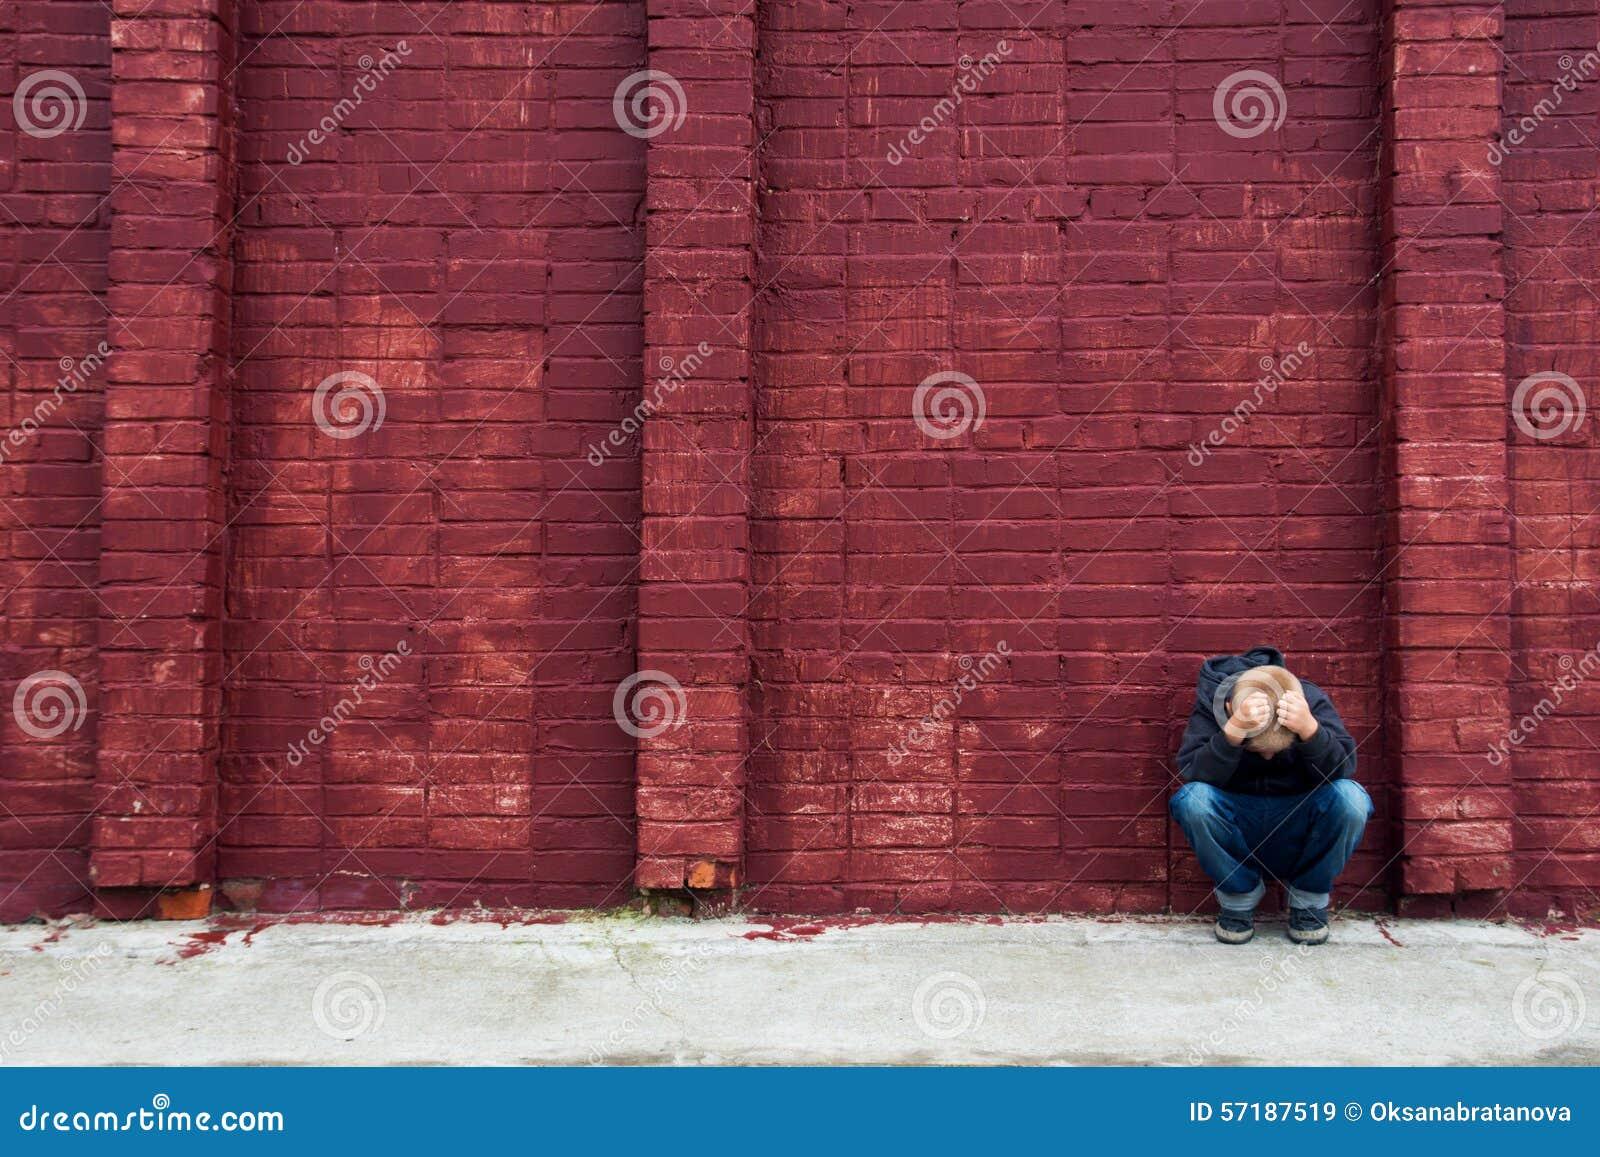 depressed child and brick wall stock photo